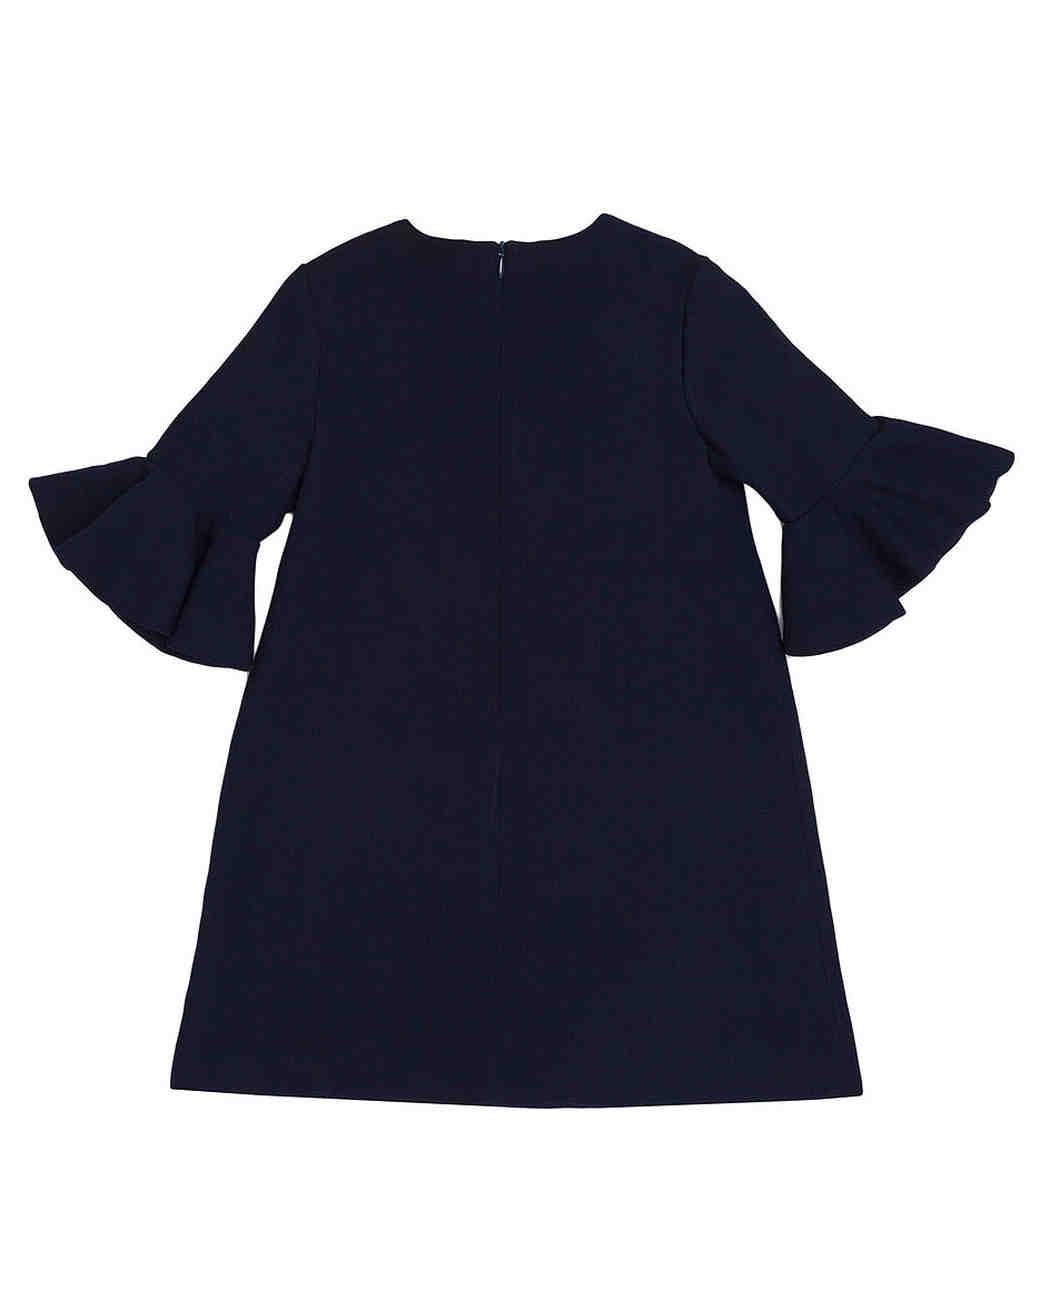 flower-girl-dresses-natty-navy-wool-flounce-sleeve-dress-0216.jpg